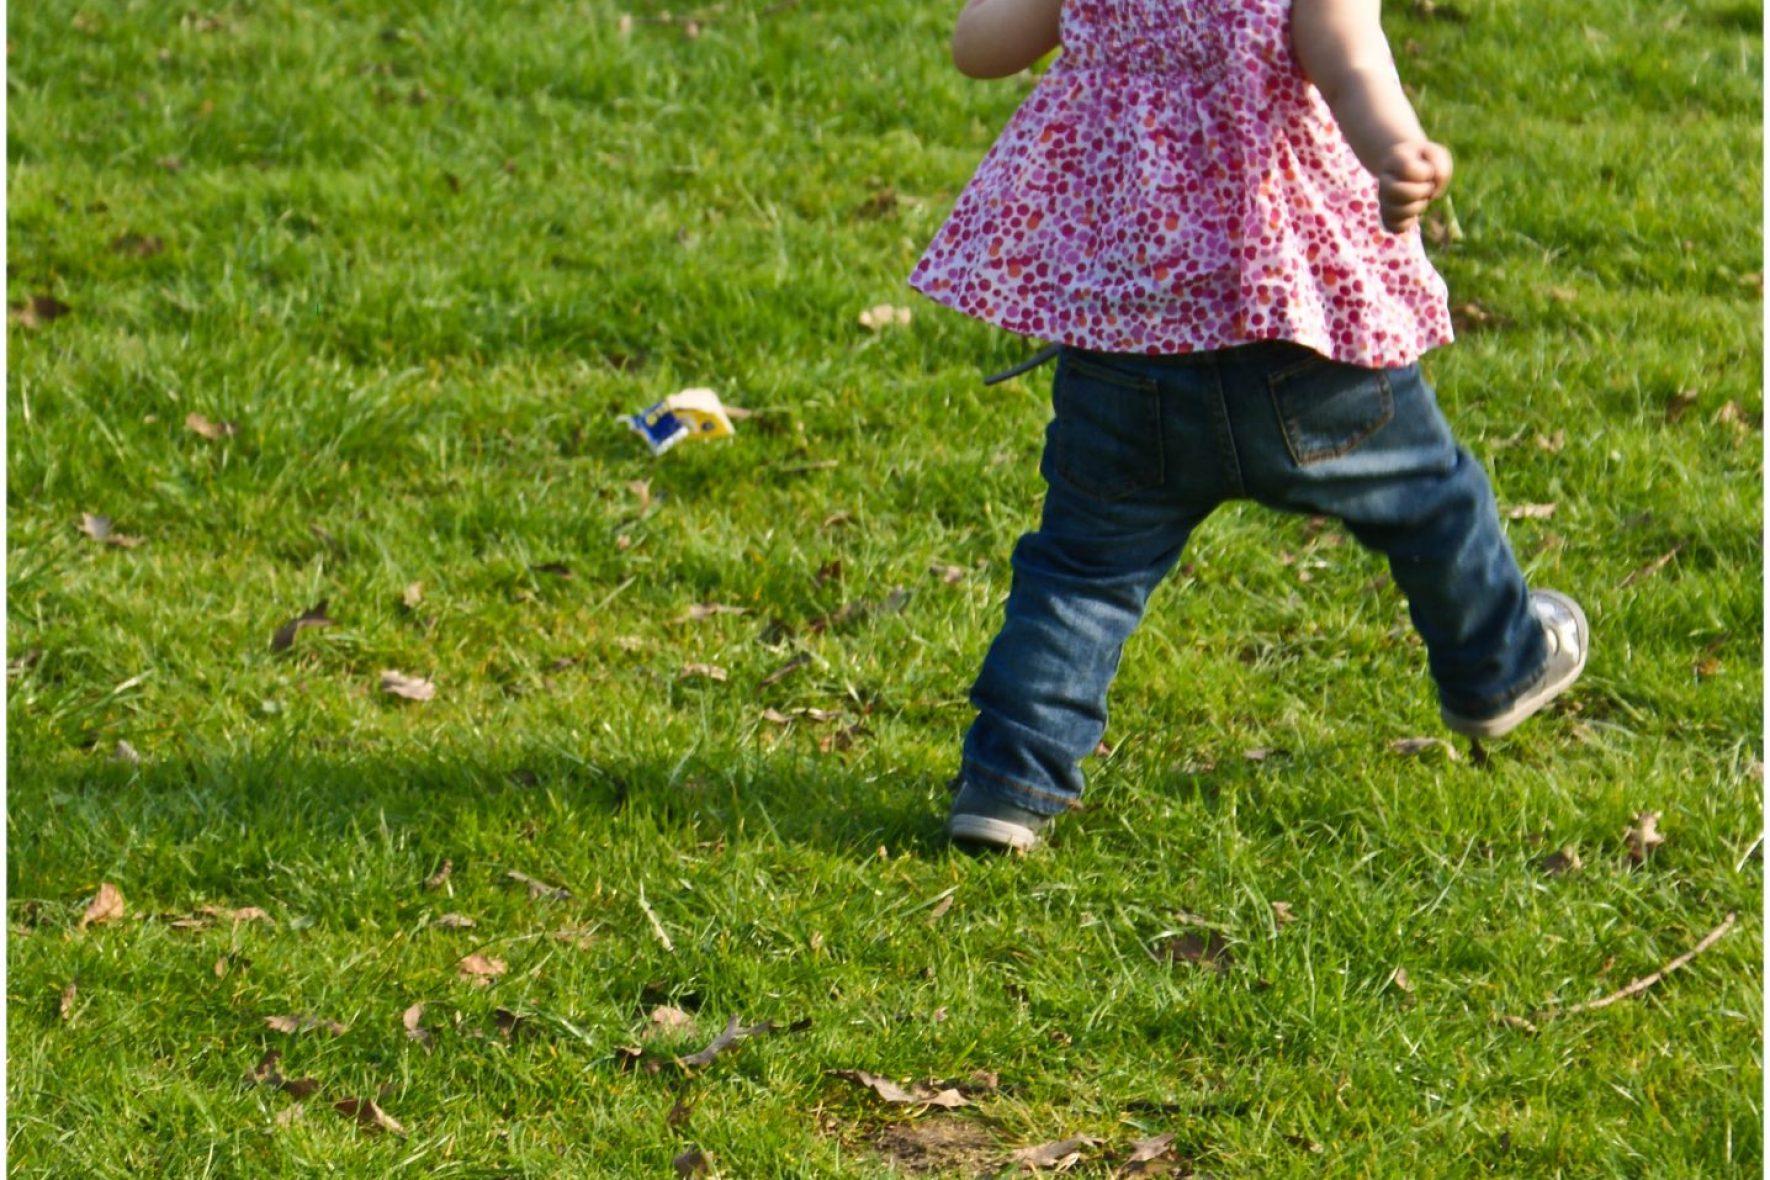 Heaton Park, Heaton Park Manchester, Isabelle Running, Toddler running, running toddler